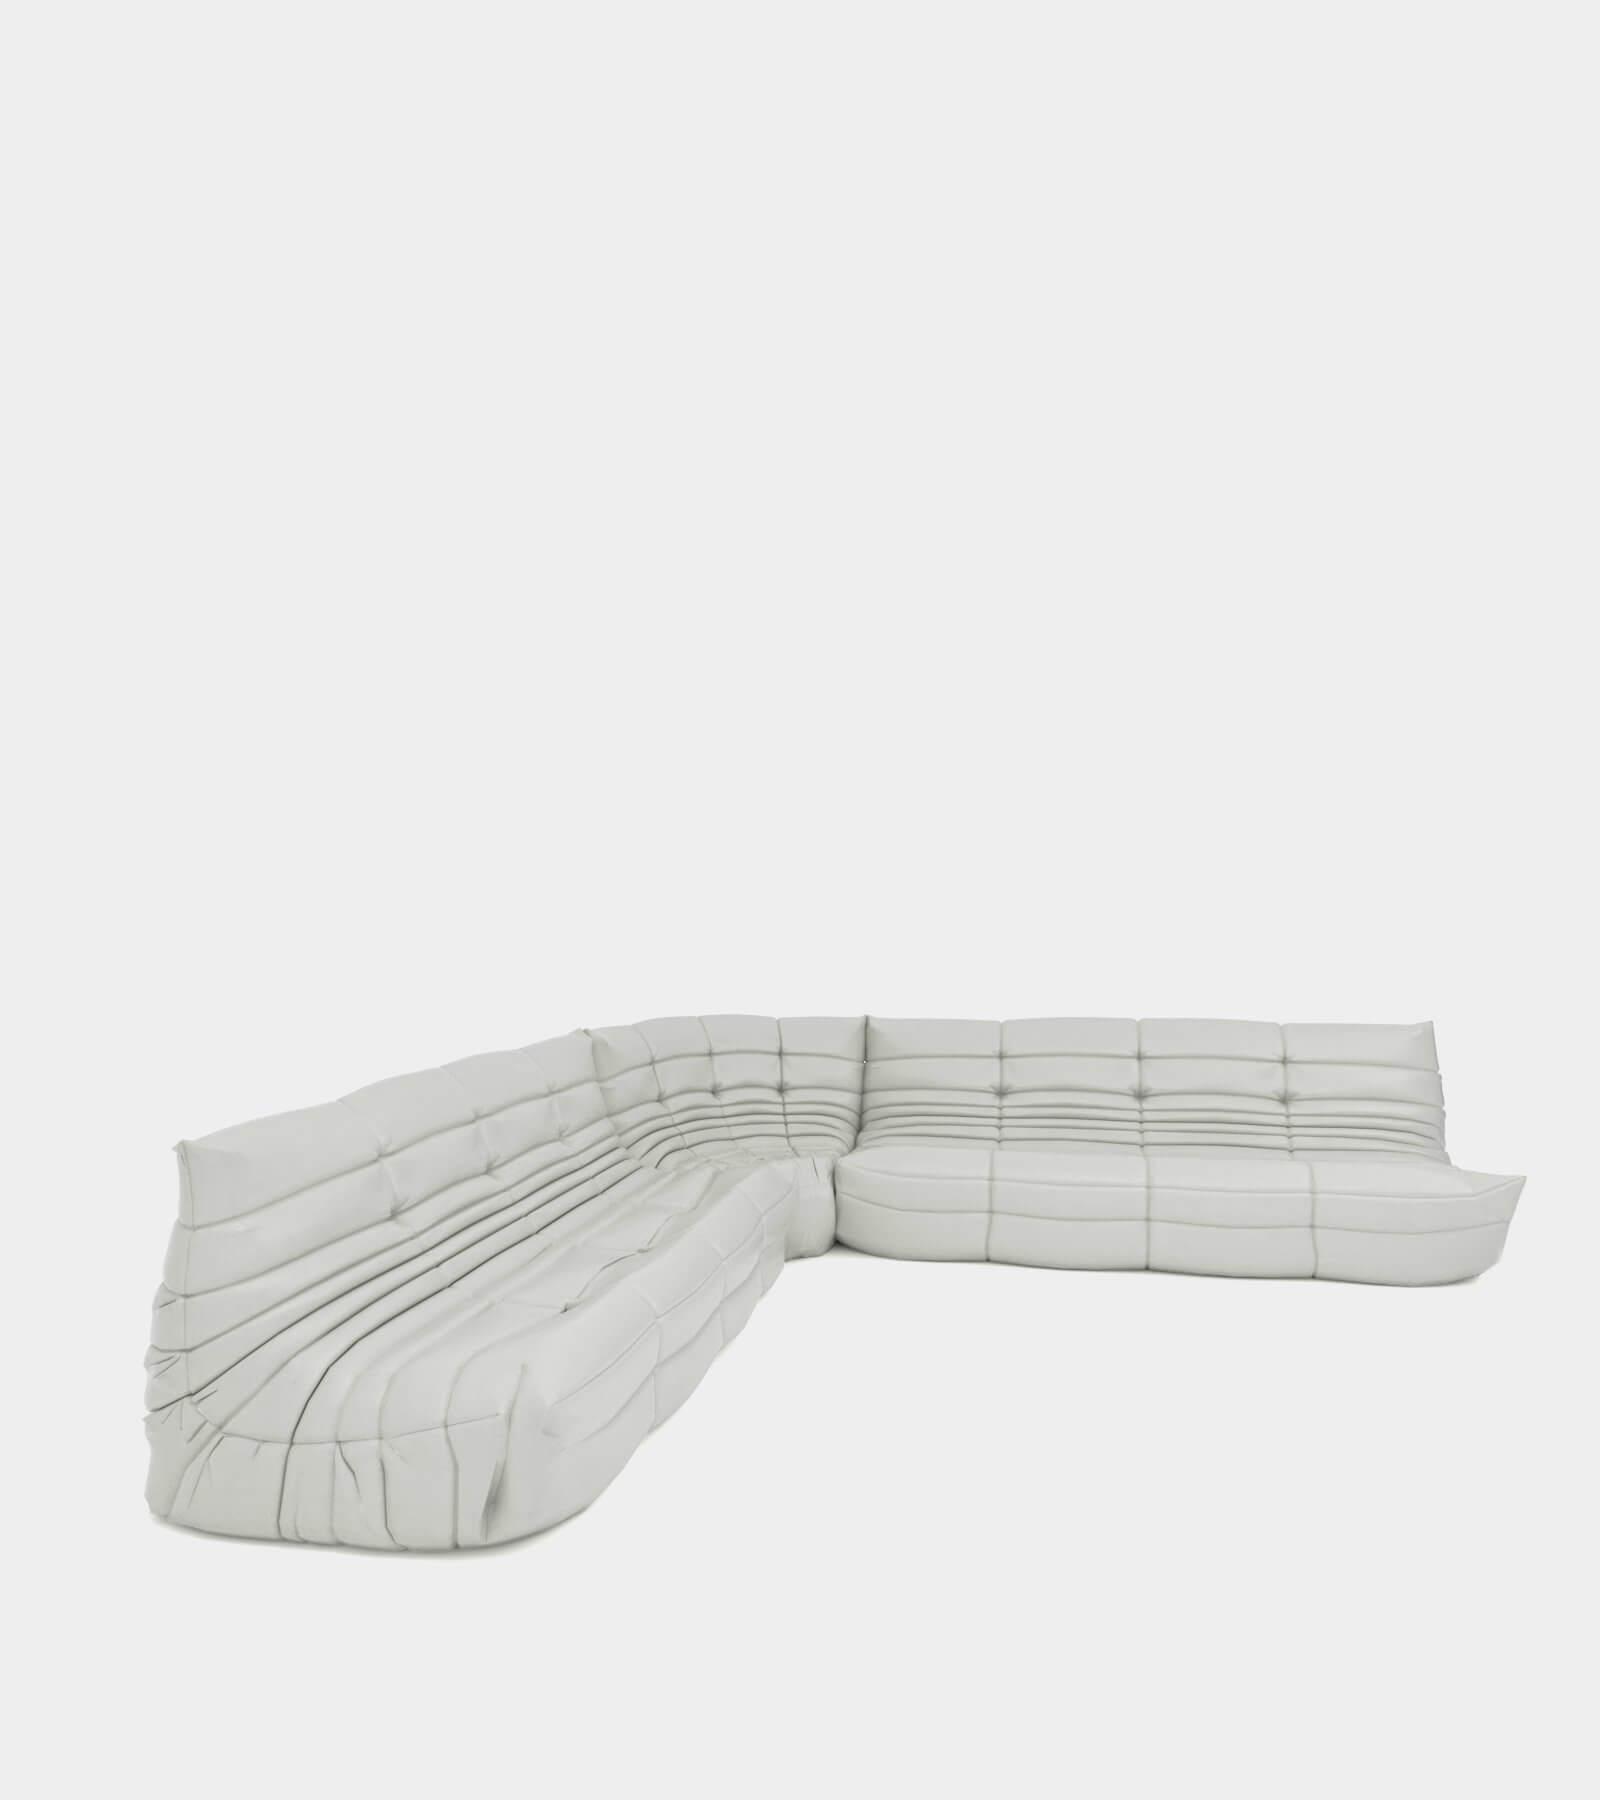 Cozy modular sofa landscape - 3D Model